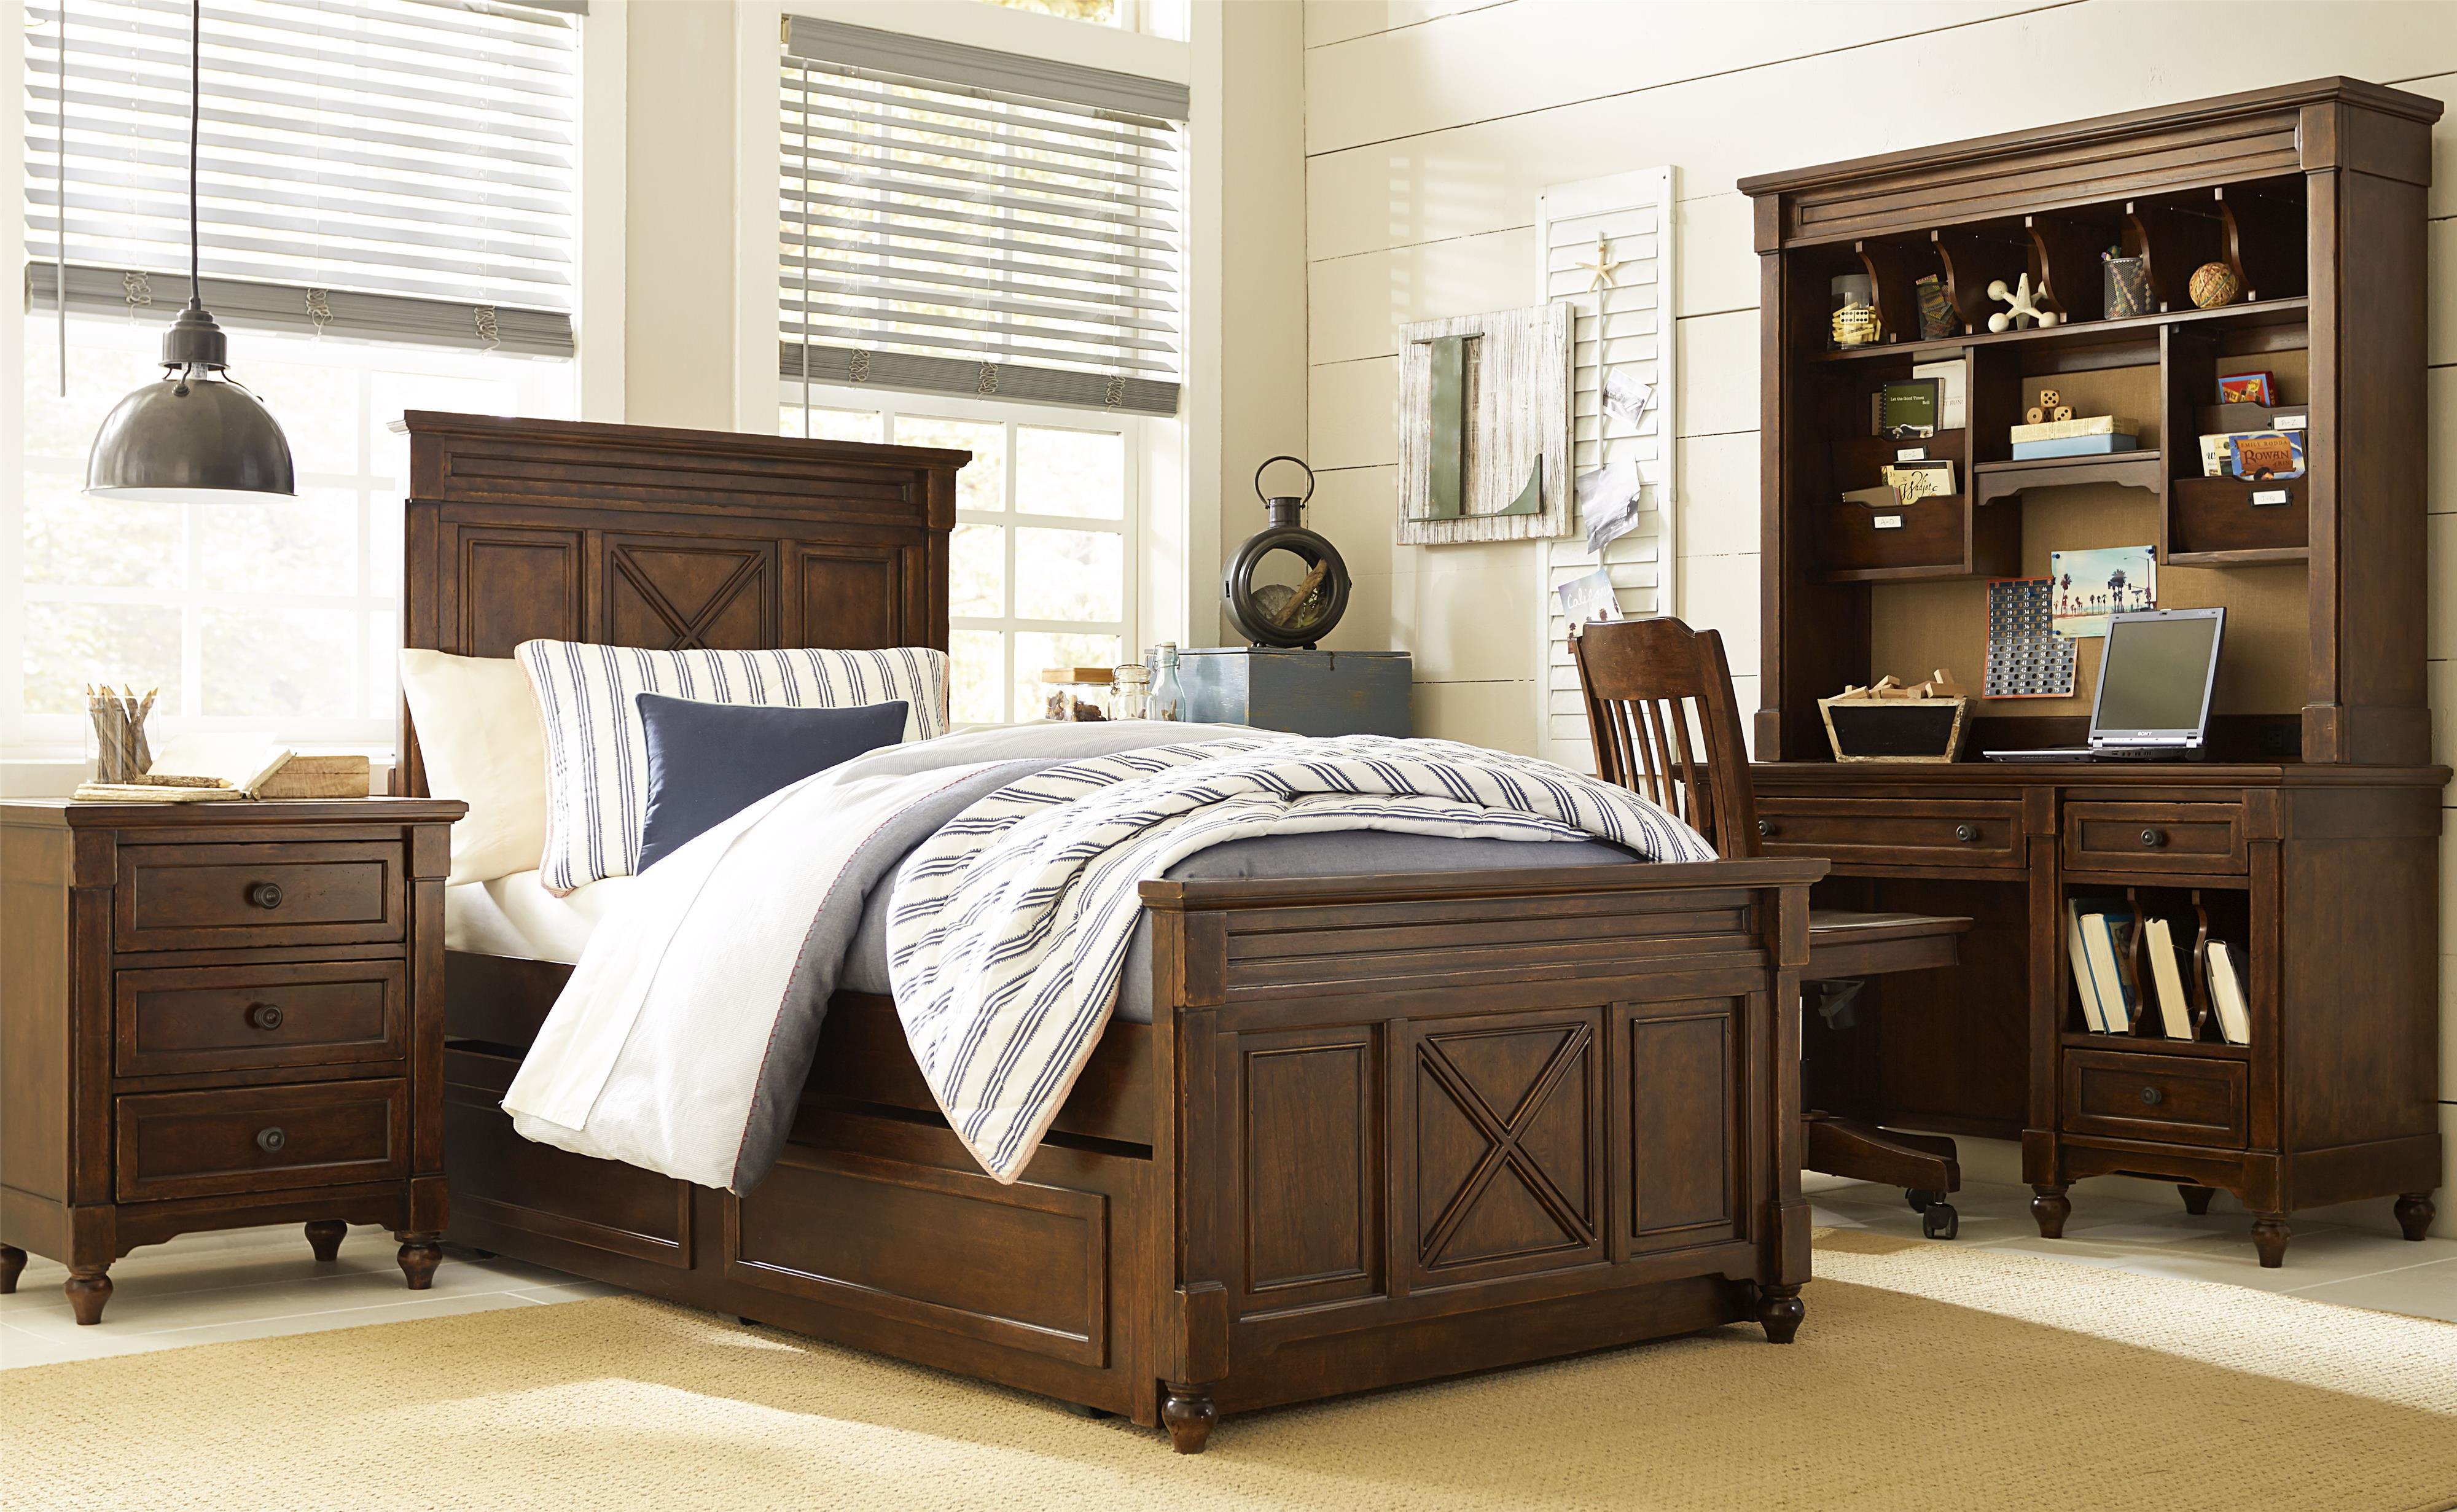 Legacy Classic Kids Big Sur By Wendy Bellissimo Full Panel Bed   Wayside  Furniture   Headboard U0026 Footboard